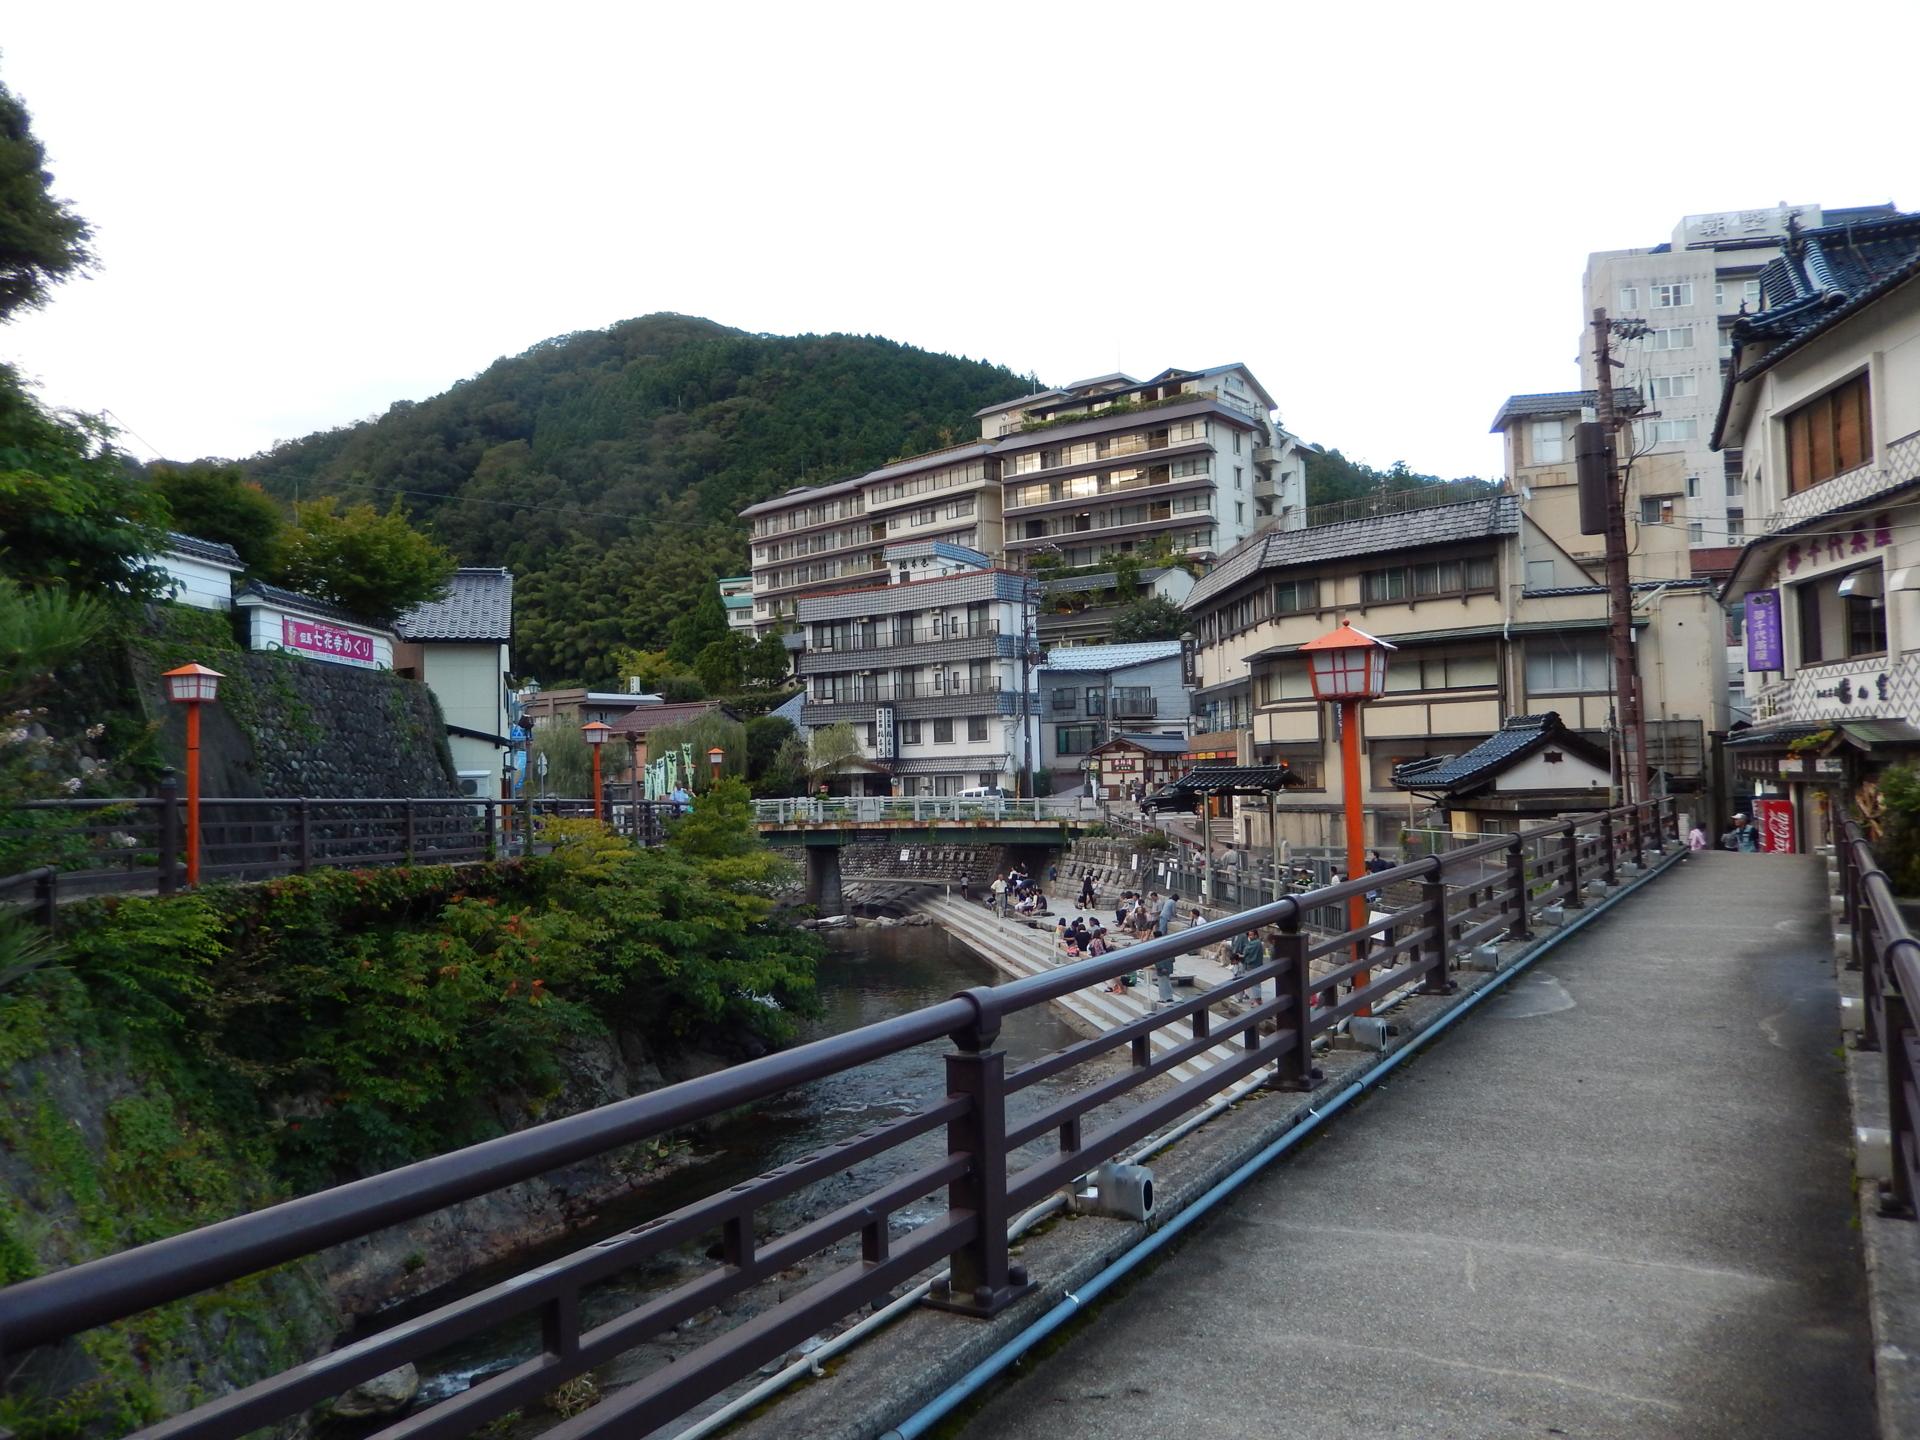 f:id:ToshUeno:20140913173707j:plain